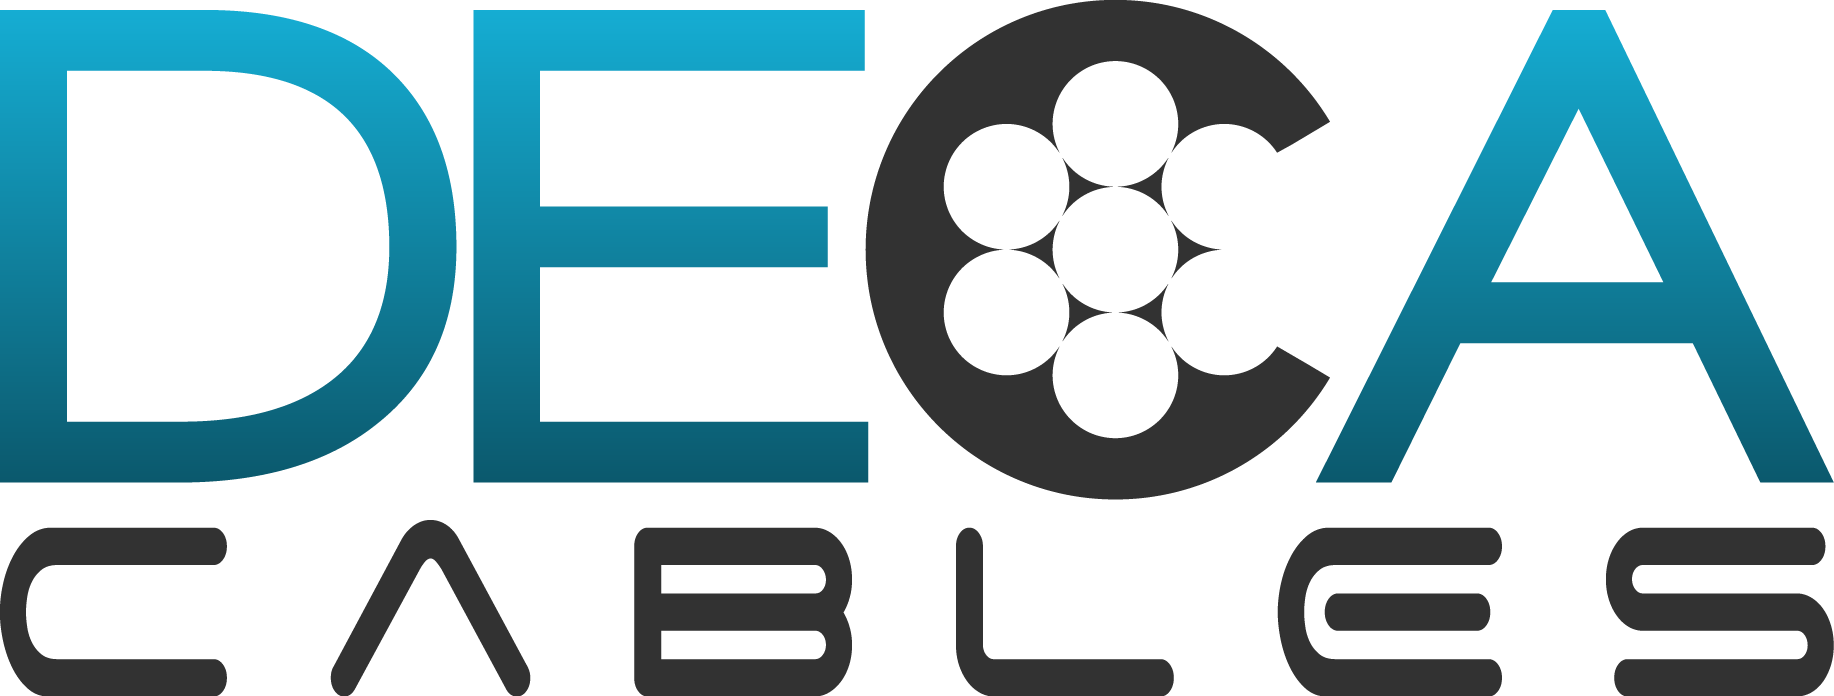 Deca Cables Logo